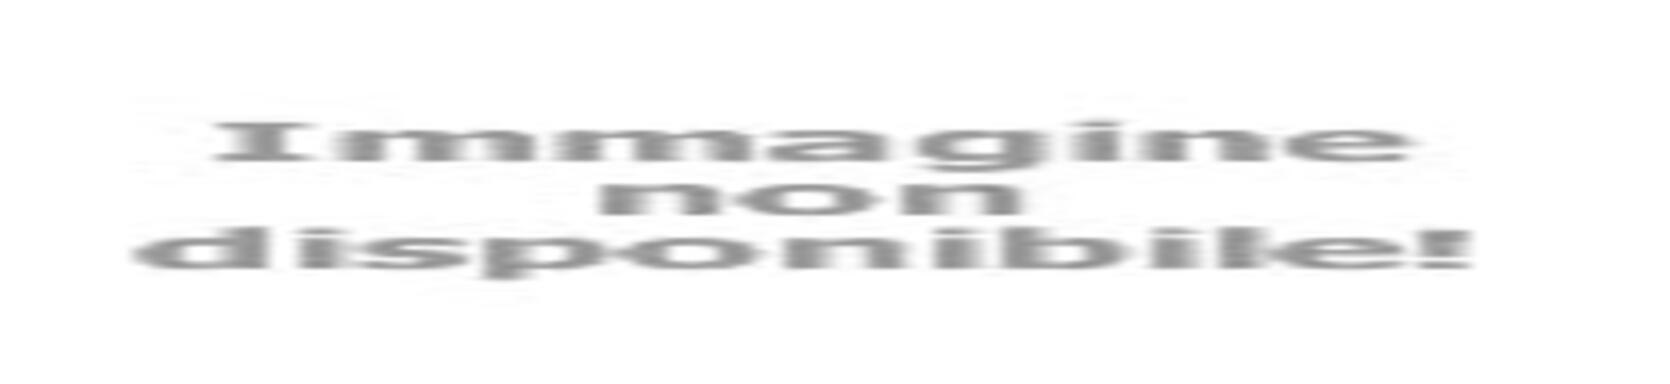 basketriminicrabs it 6-1103-video-ceccarules-n.22 003